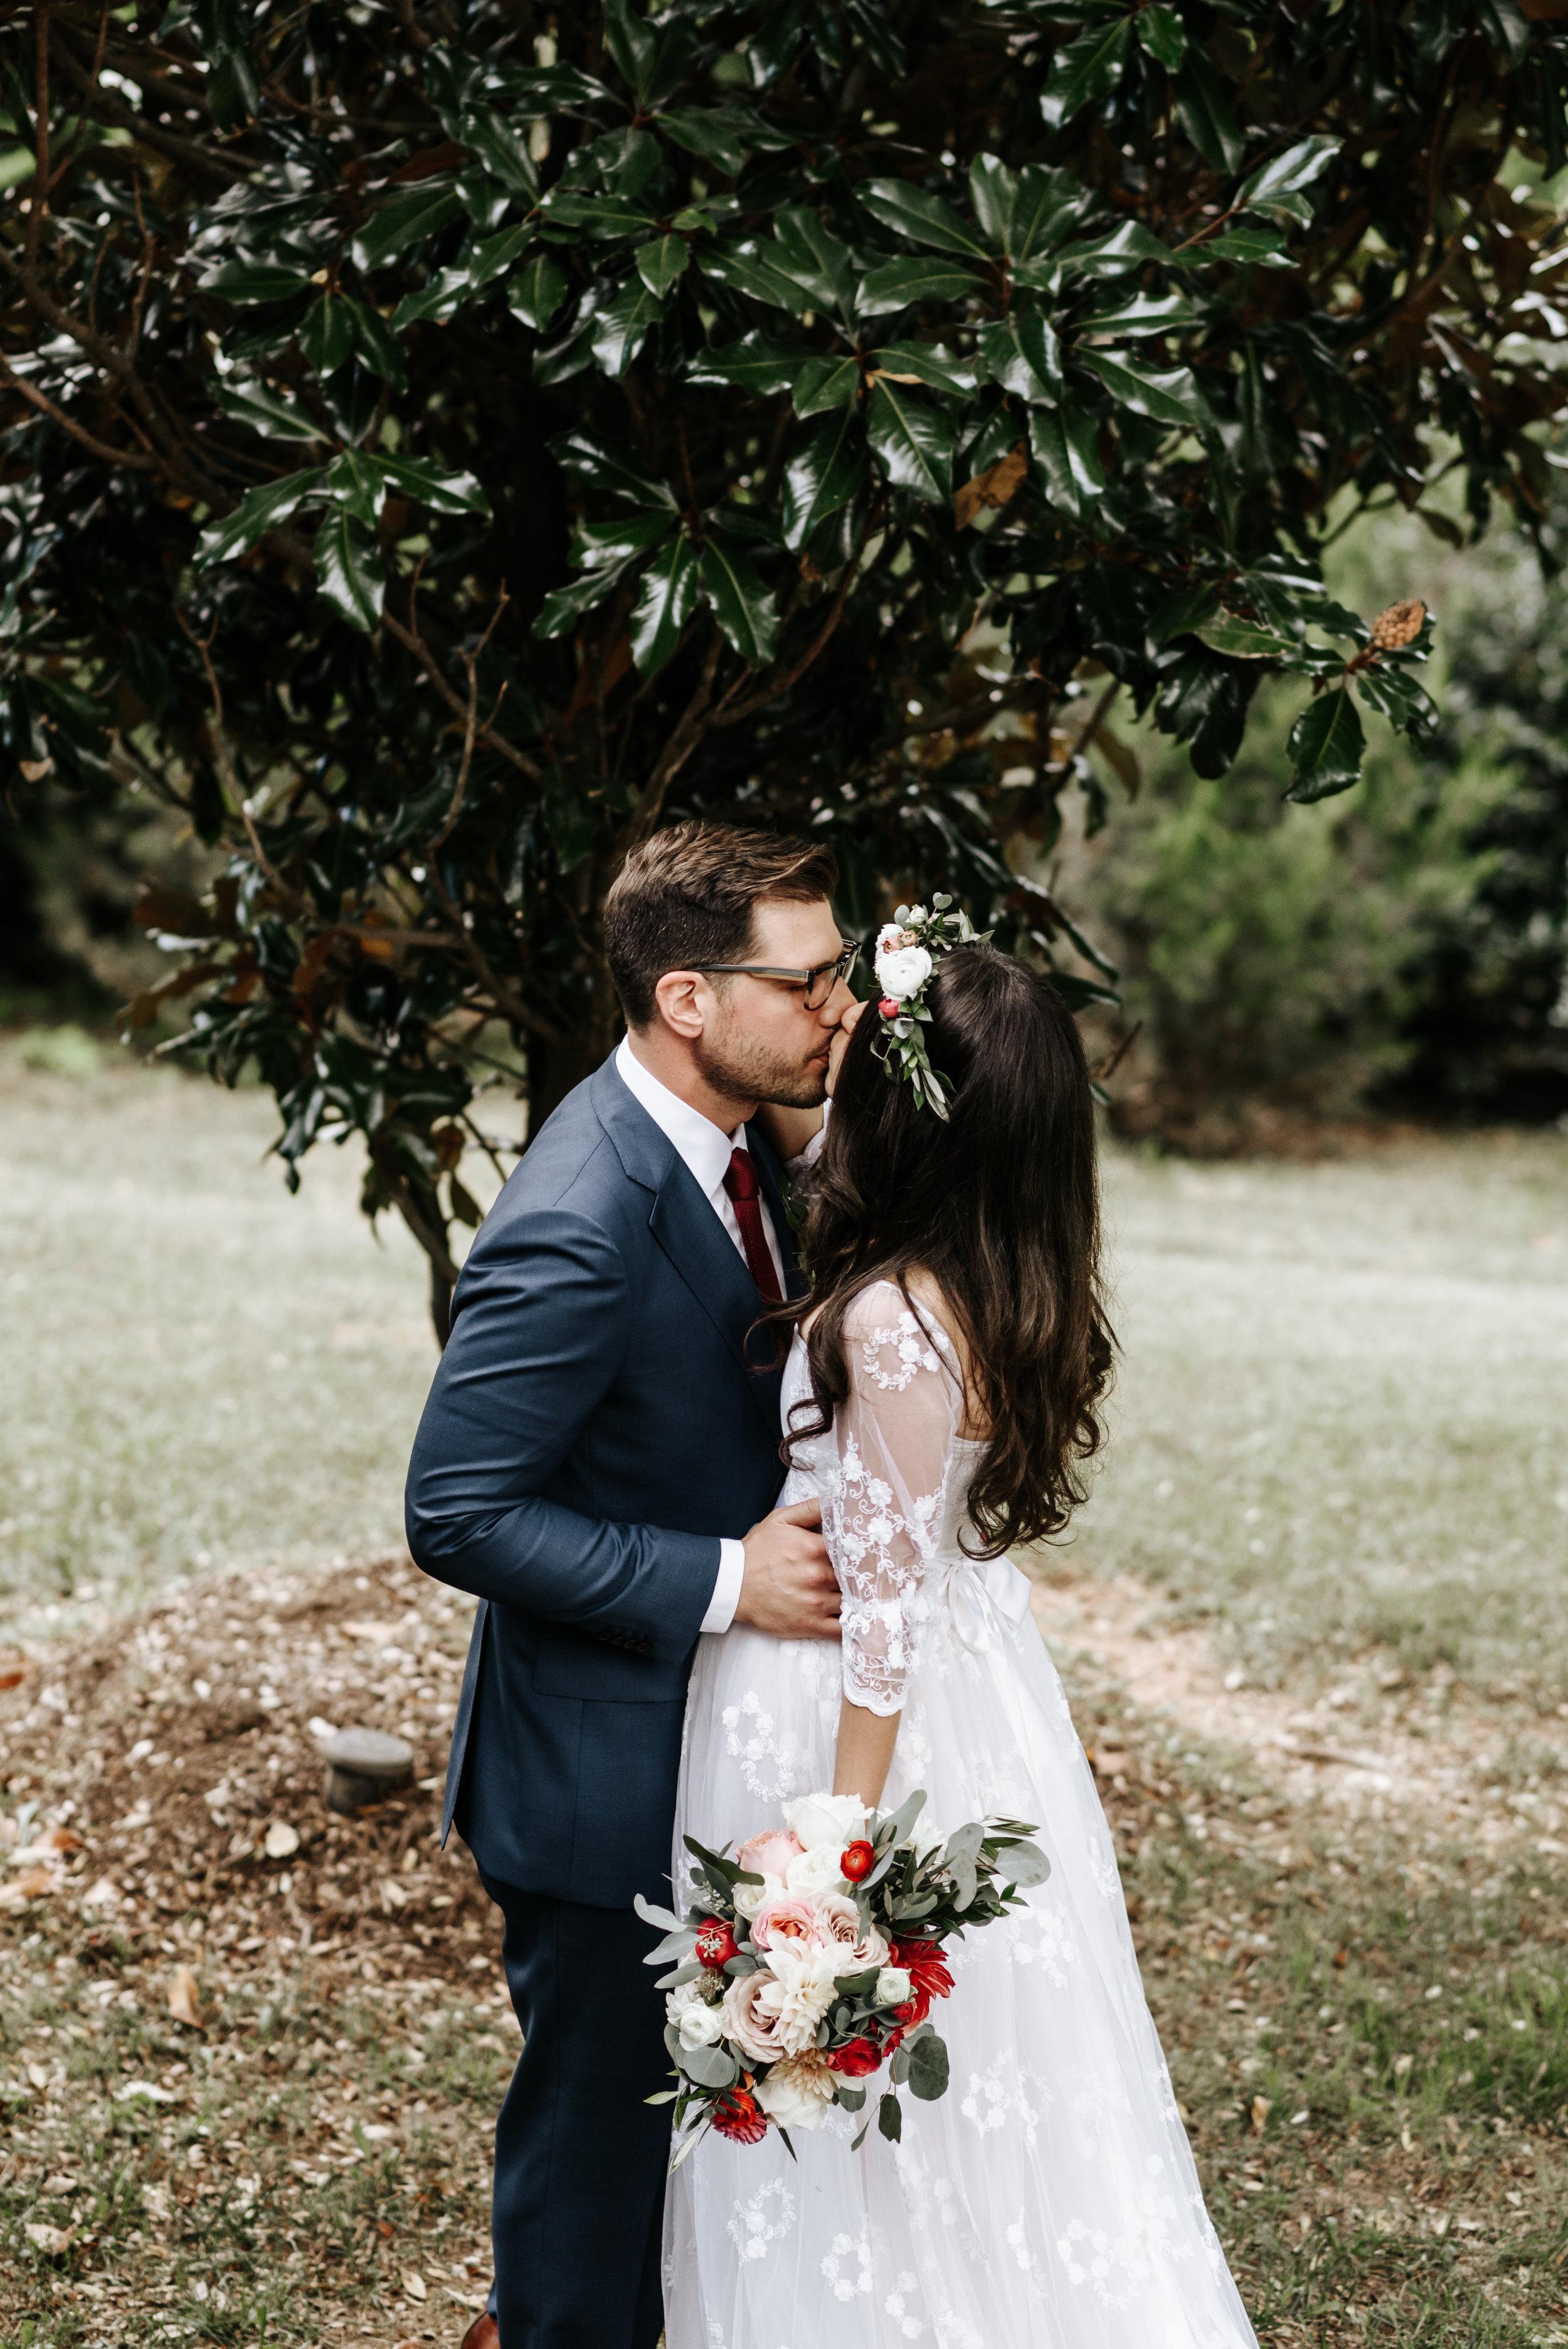 Veritas-Vineyards-and-Winery-Wedding-Photography-Afton-Virginia-Yasmin-Seth-Photography-by-V-2195.jpg